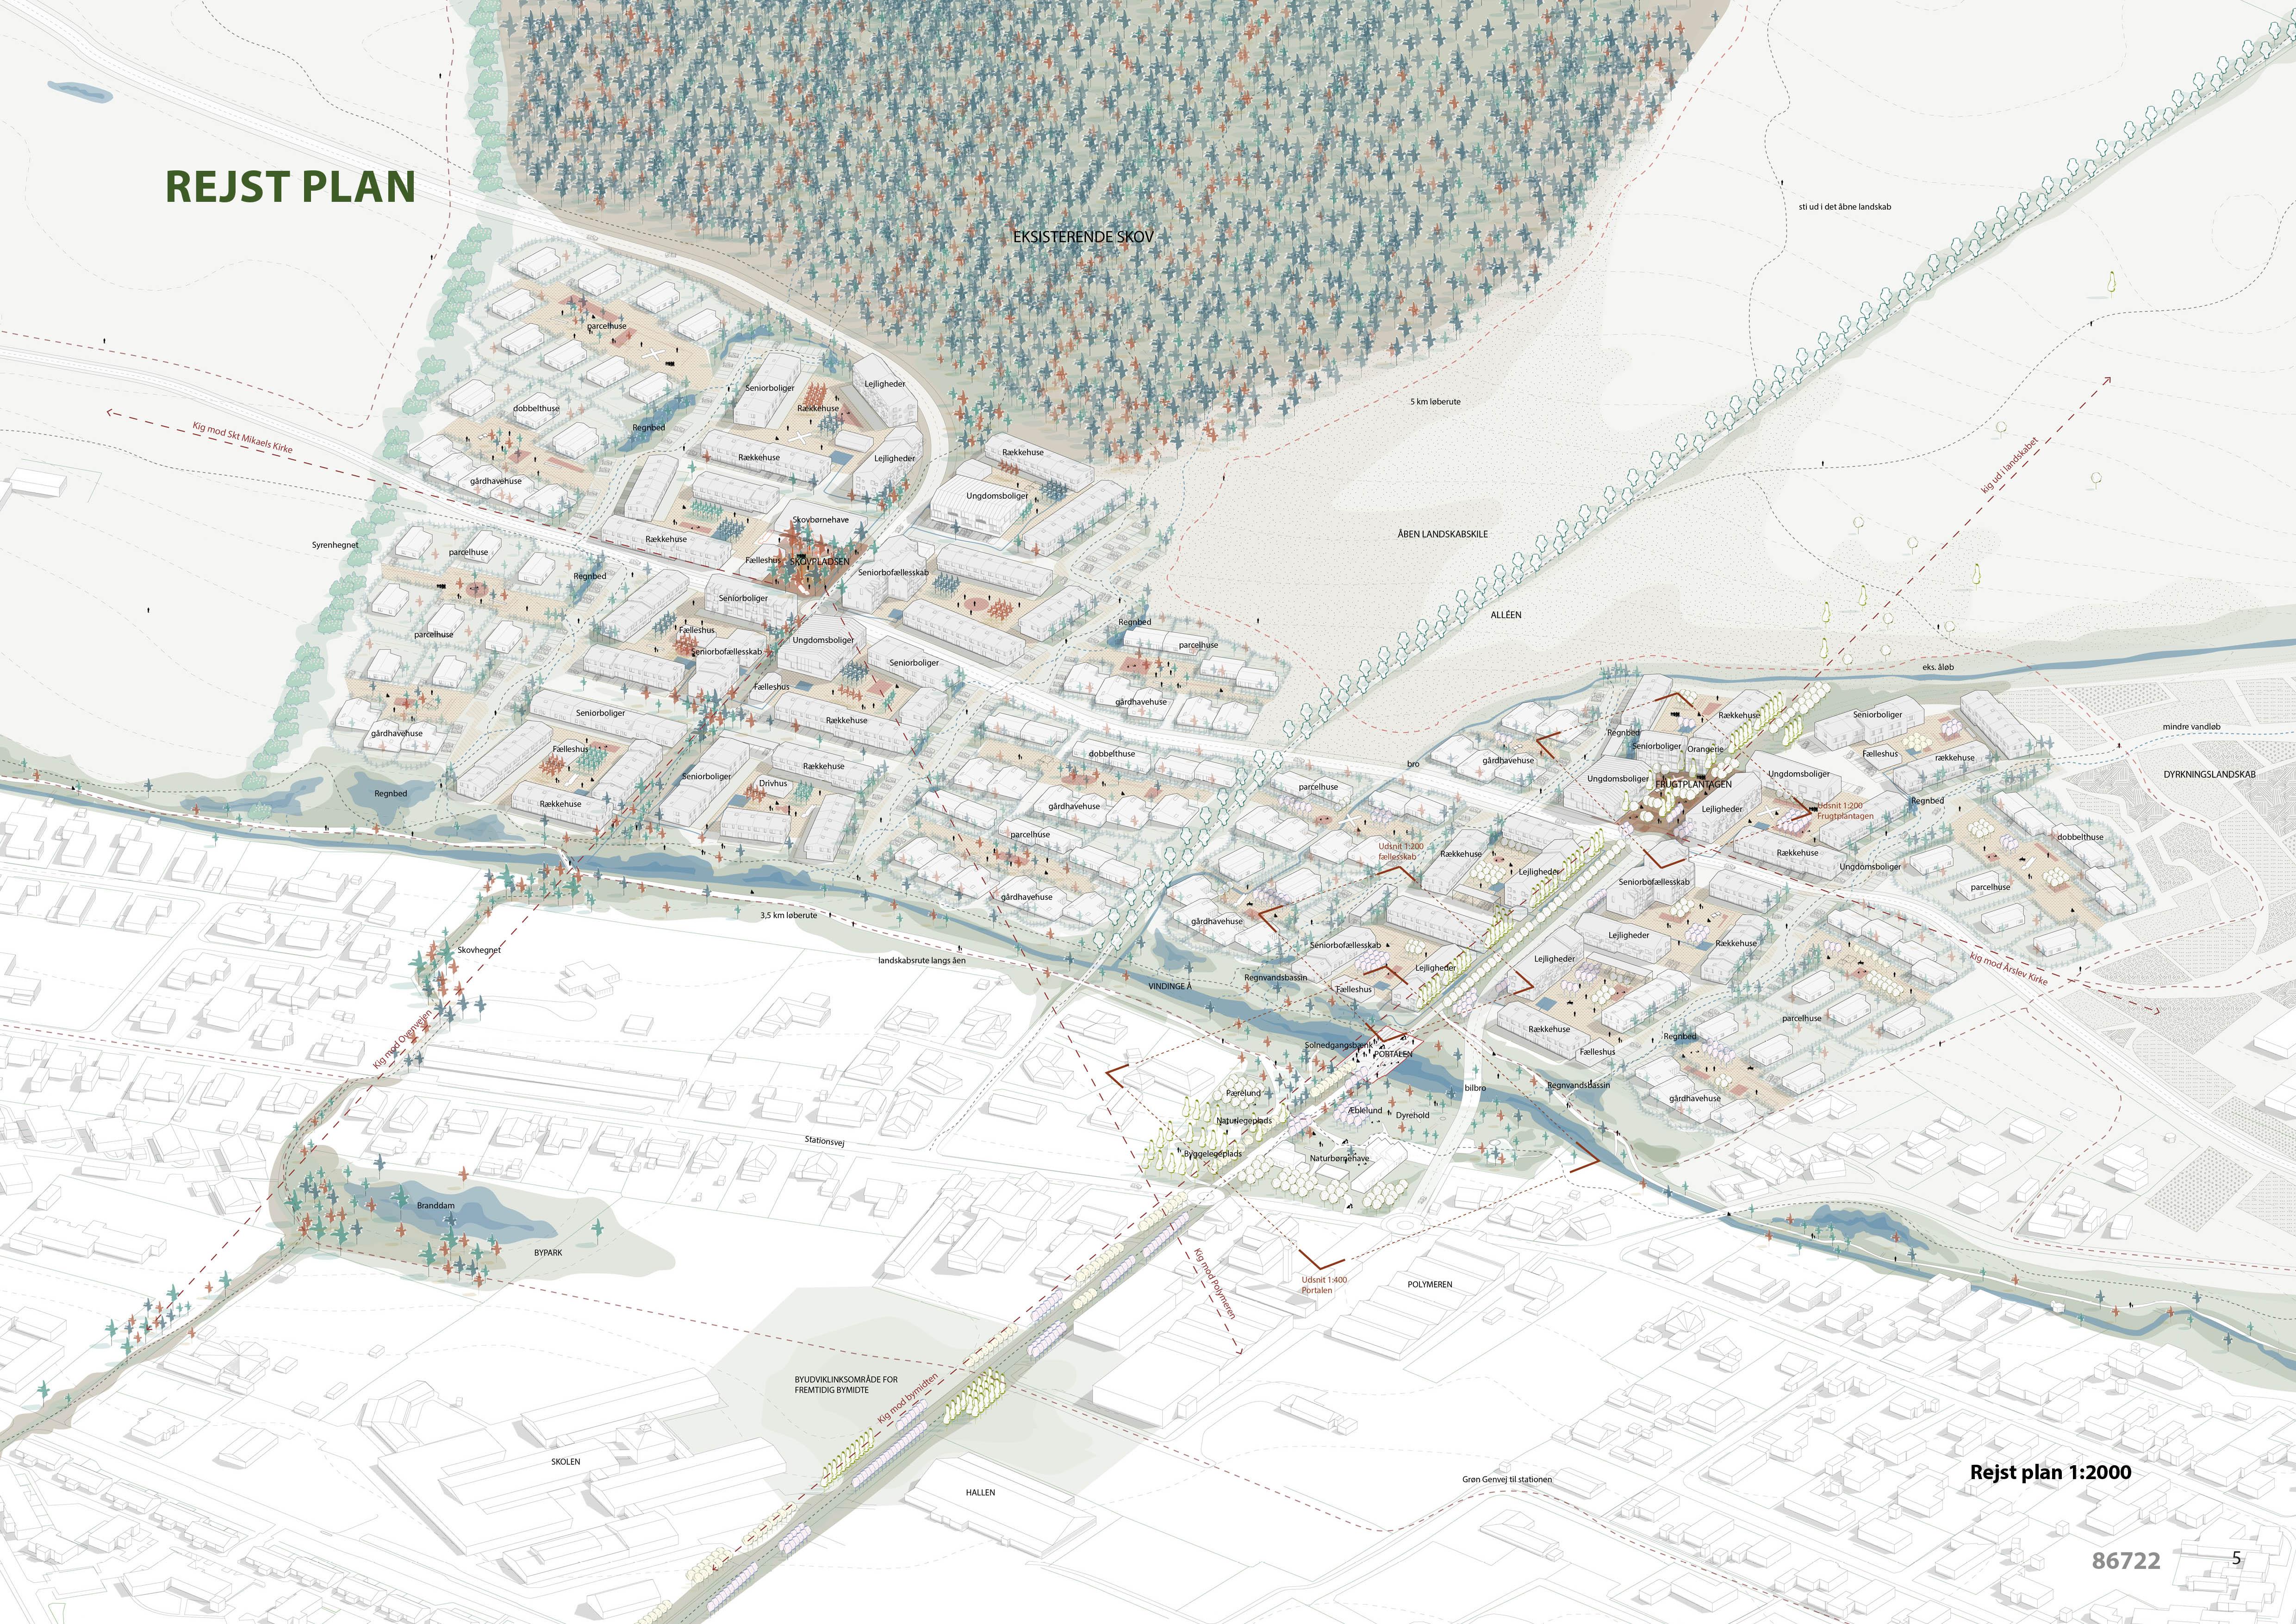 rejst-plan_aarslev-bydel_small